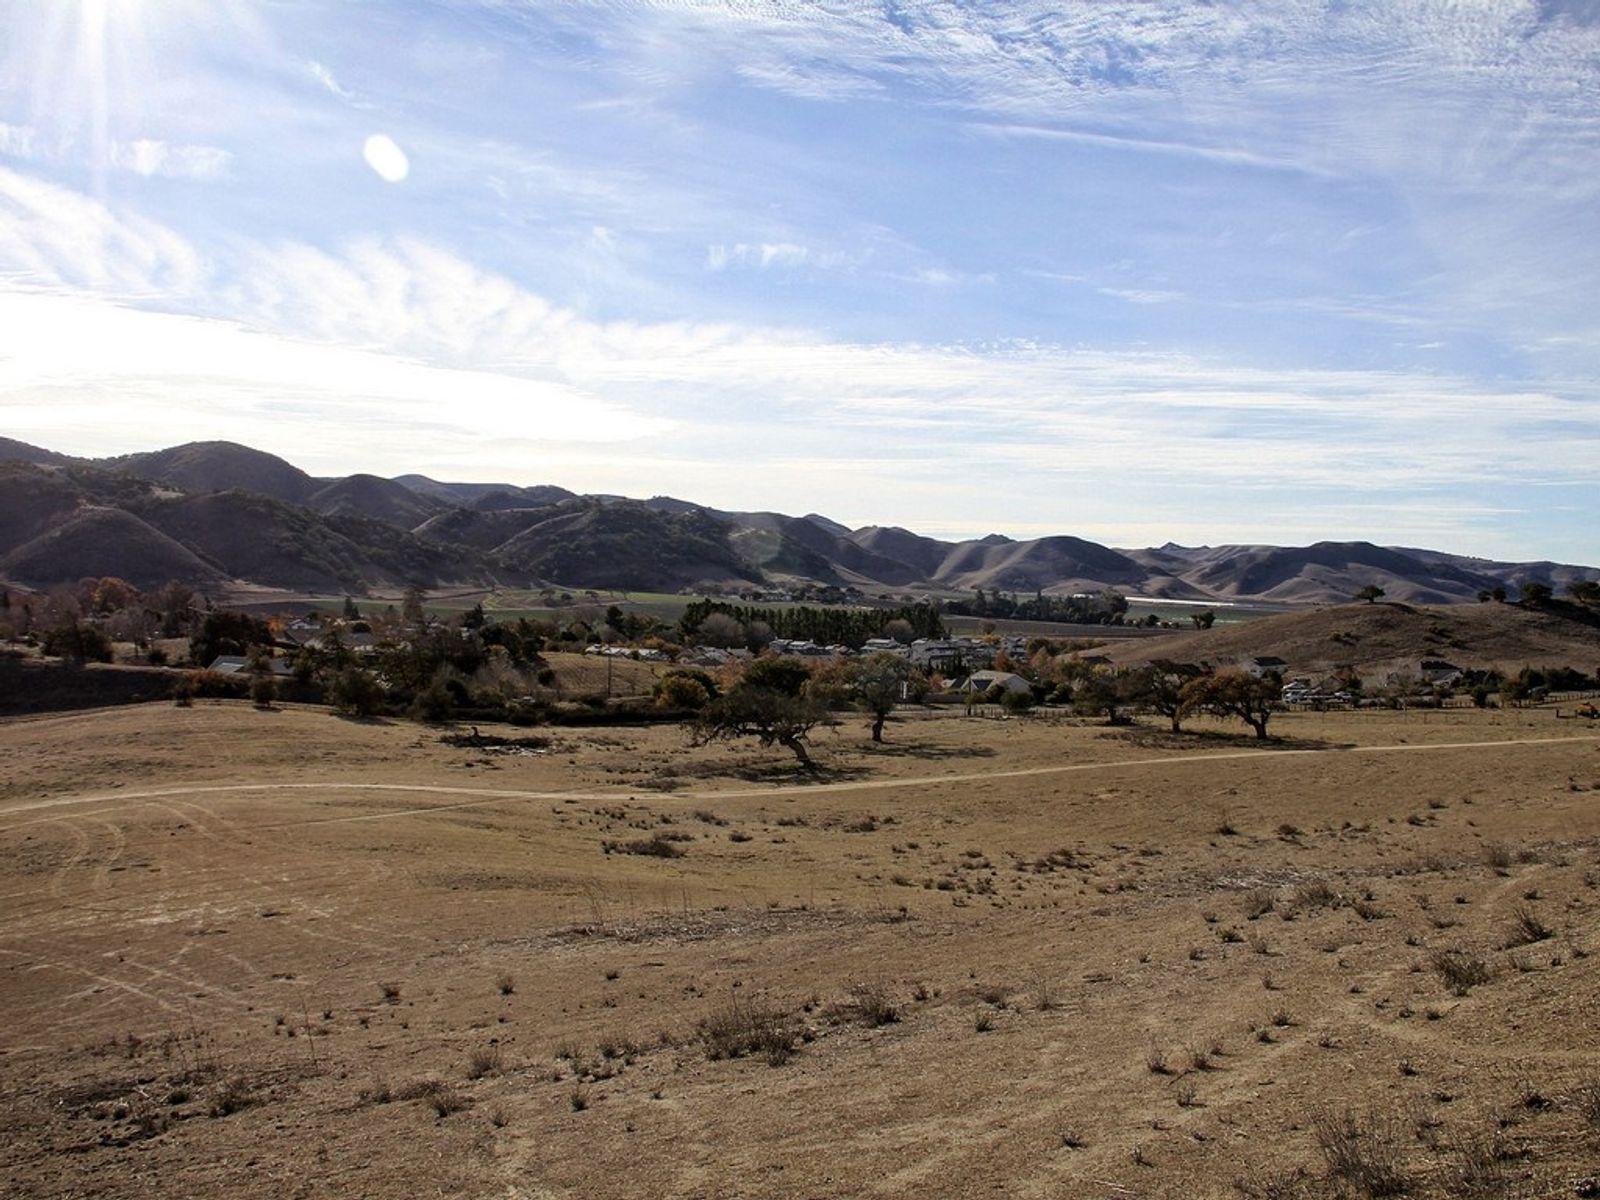 Los Alamos Opportunity